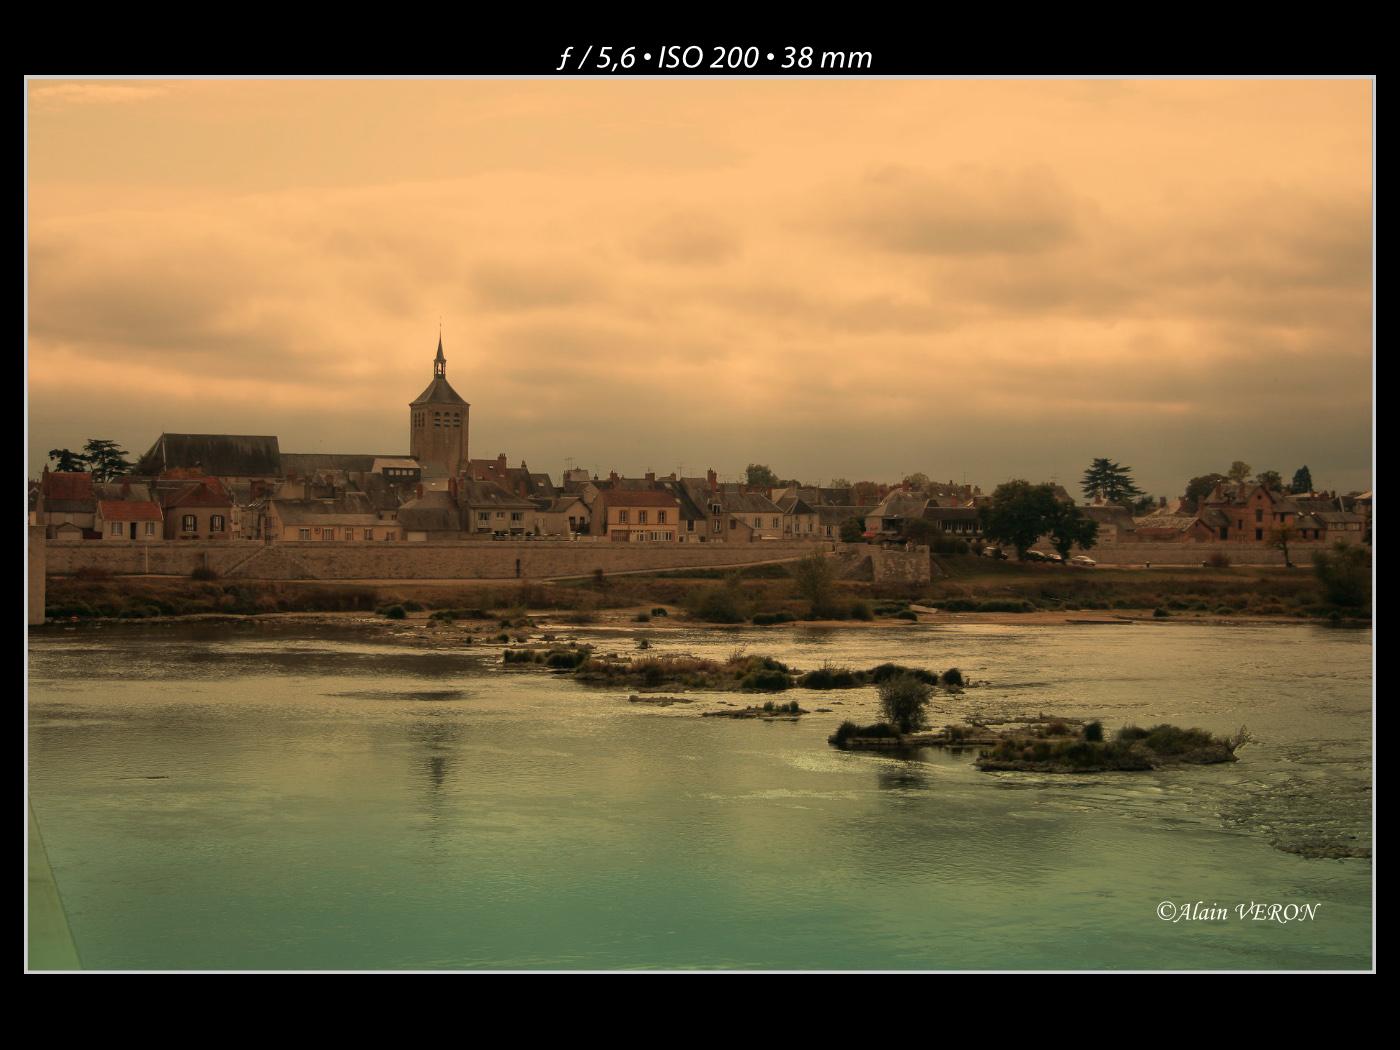 Un soir, bord de la Loire